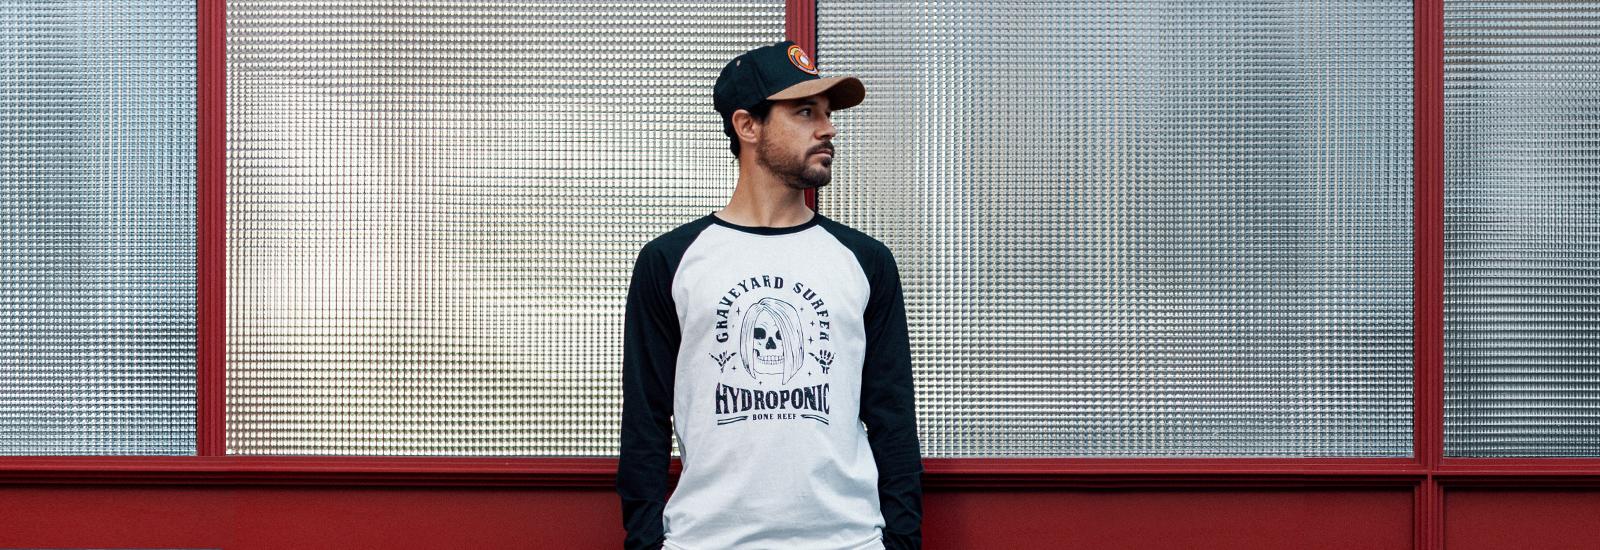 Long Sleeve T-Shirts - Hydroponic